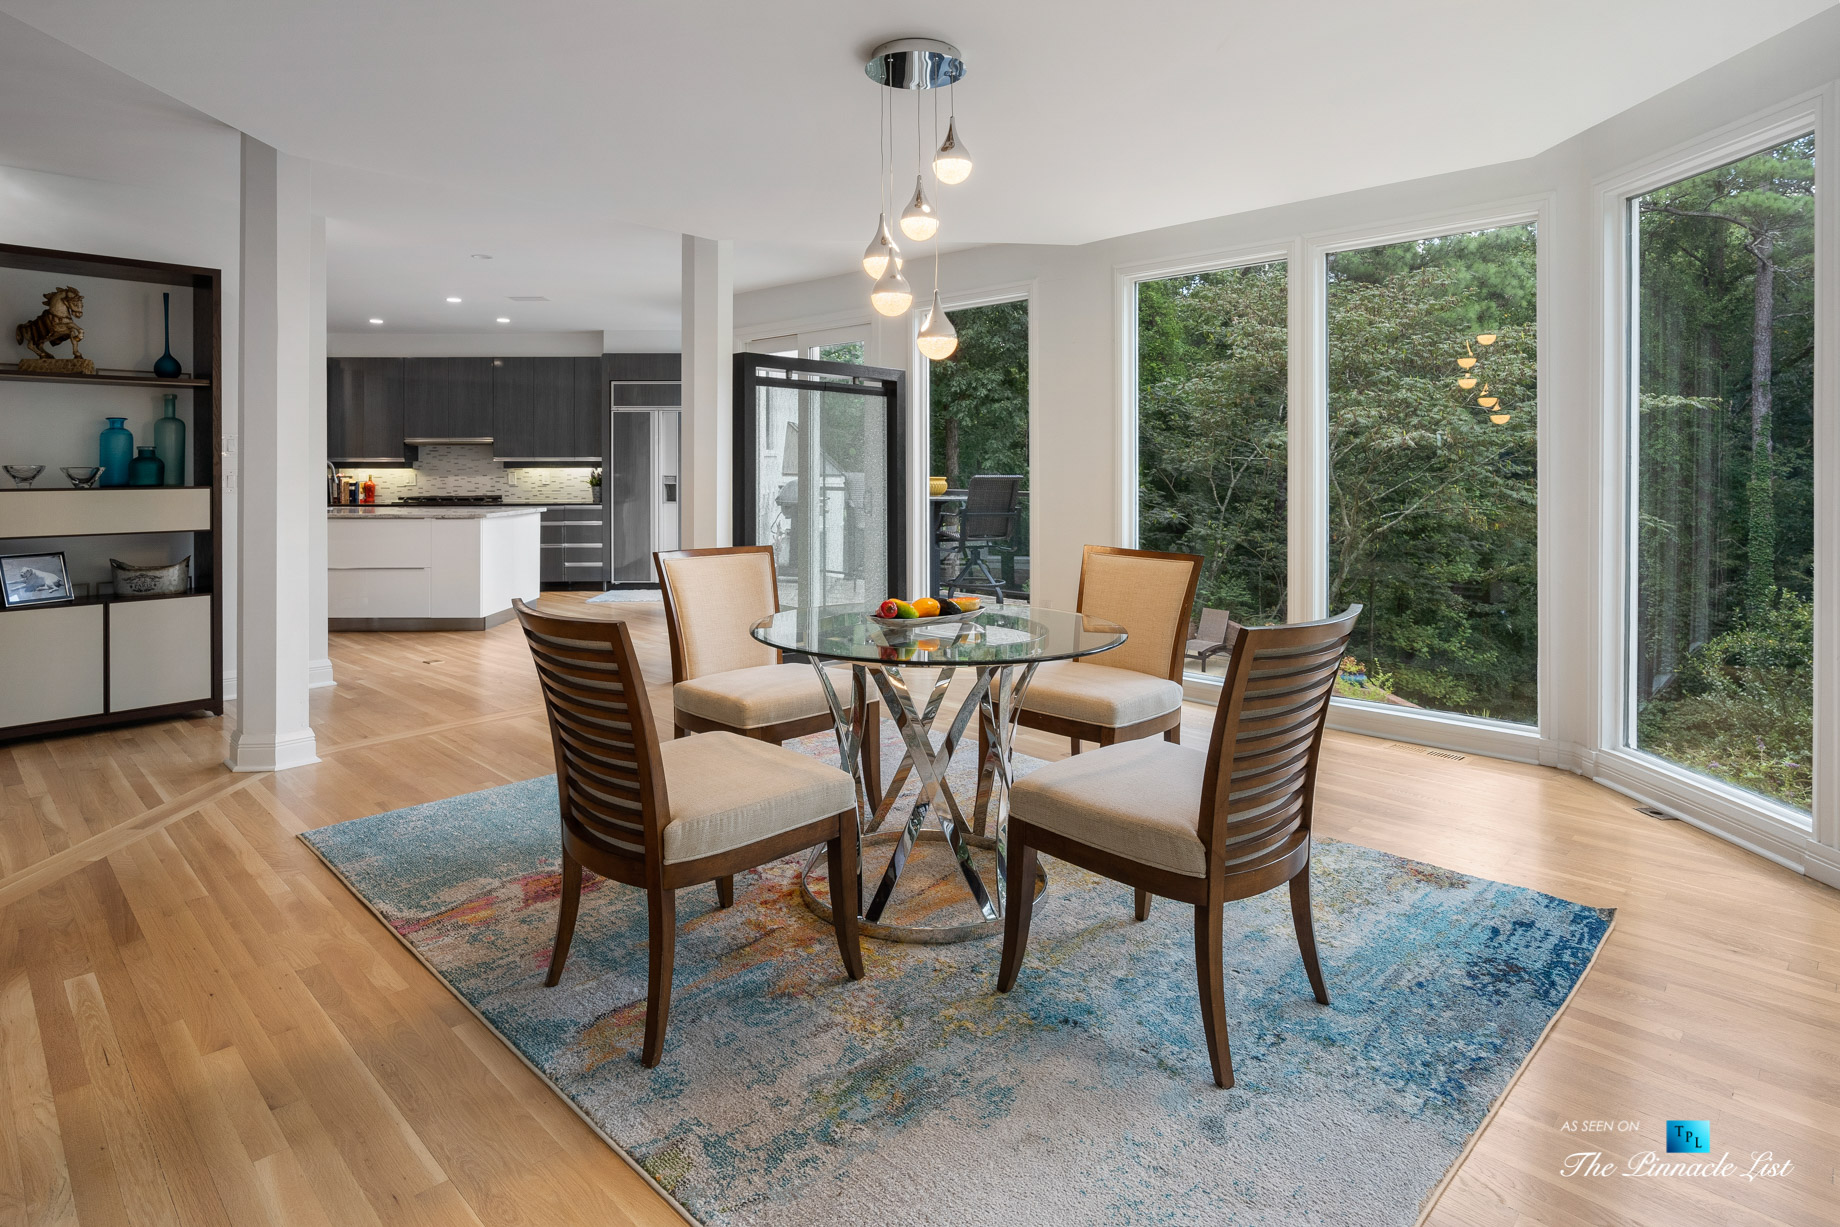 3906 Paces Ferry Rd NW, Atlanta, GA, USA - Kitchen Table Window View - Luxury Real Estate - Buckhead Home